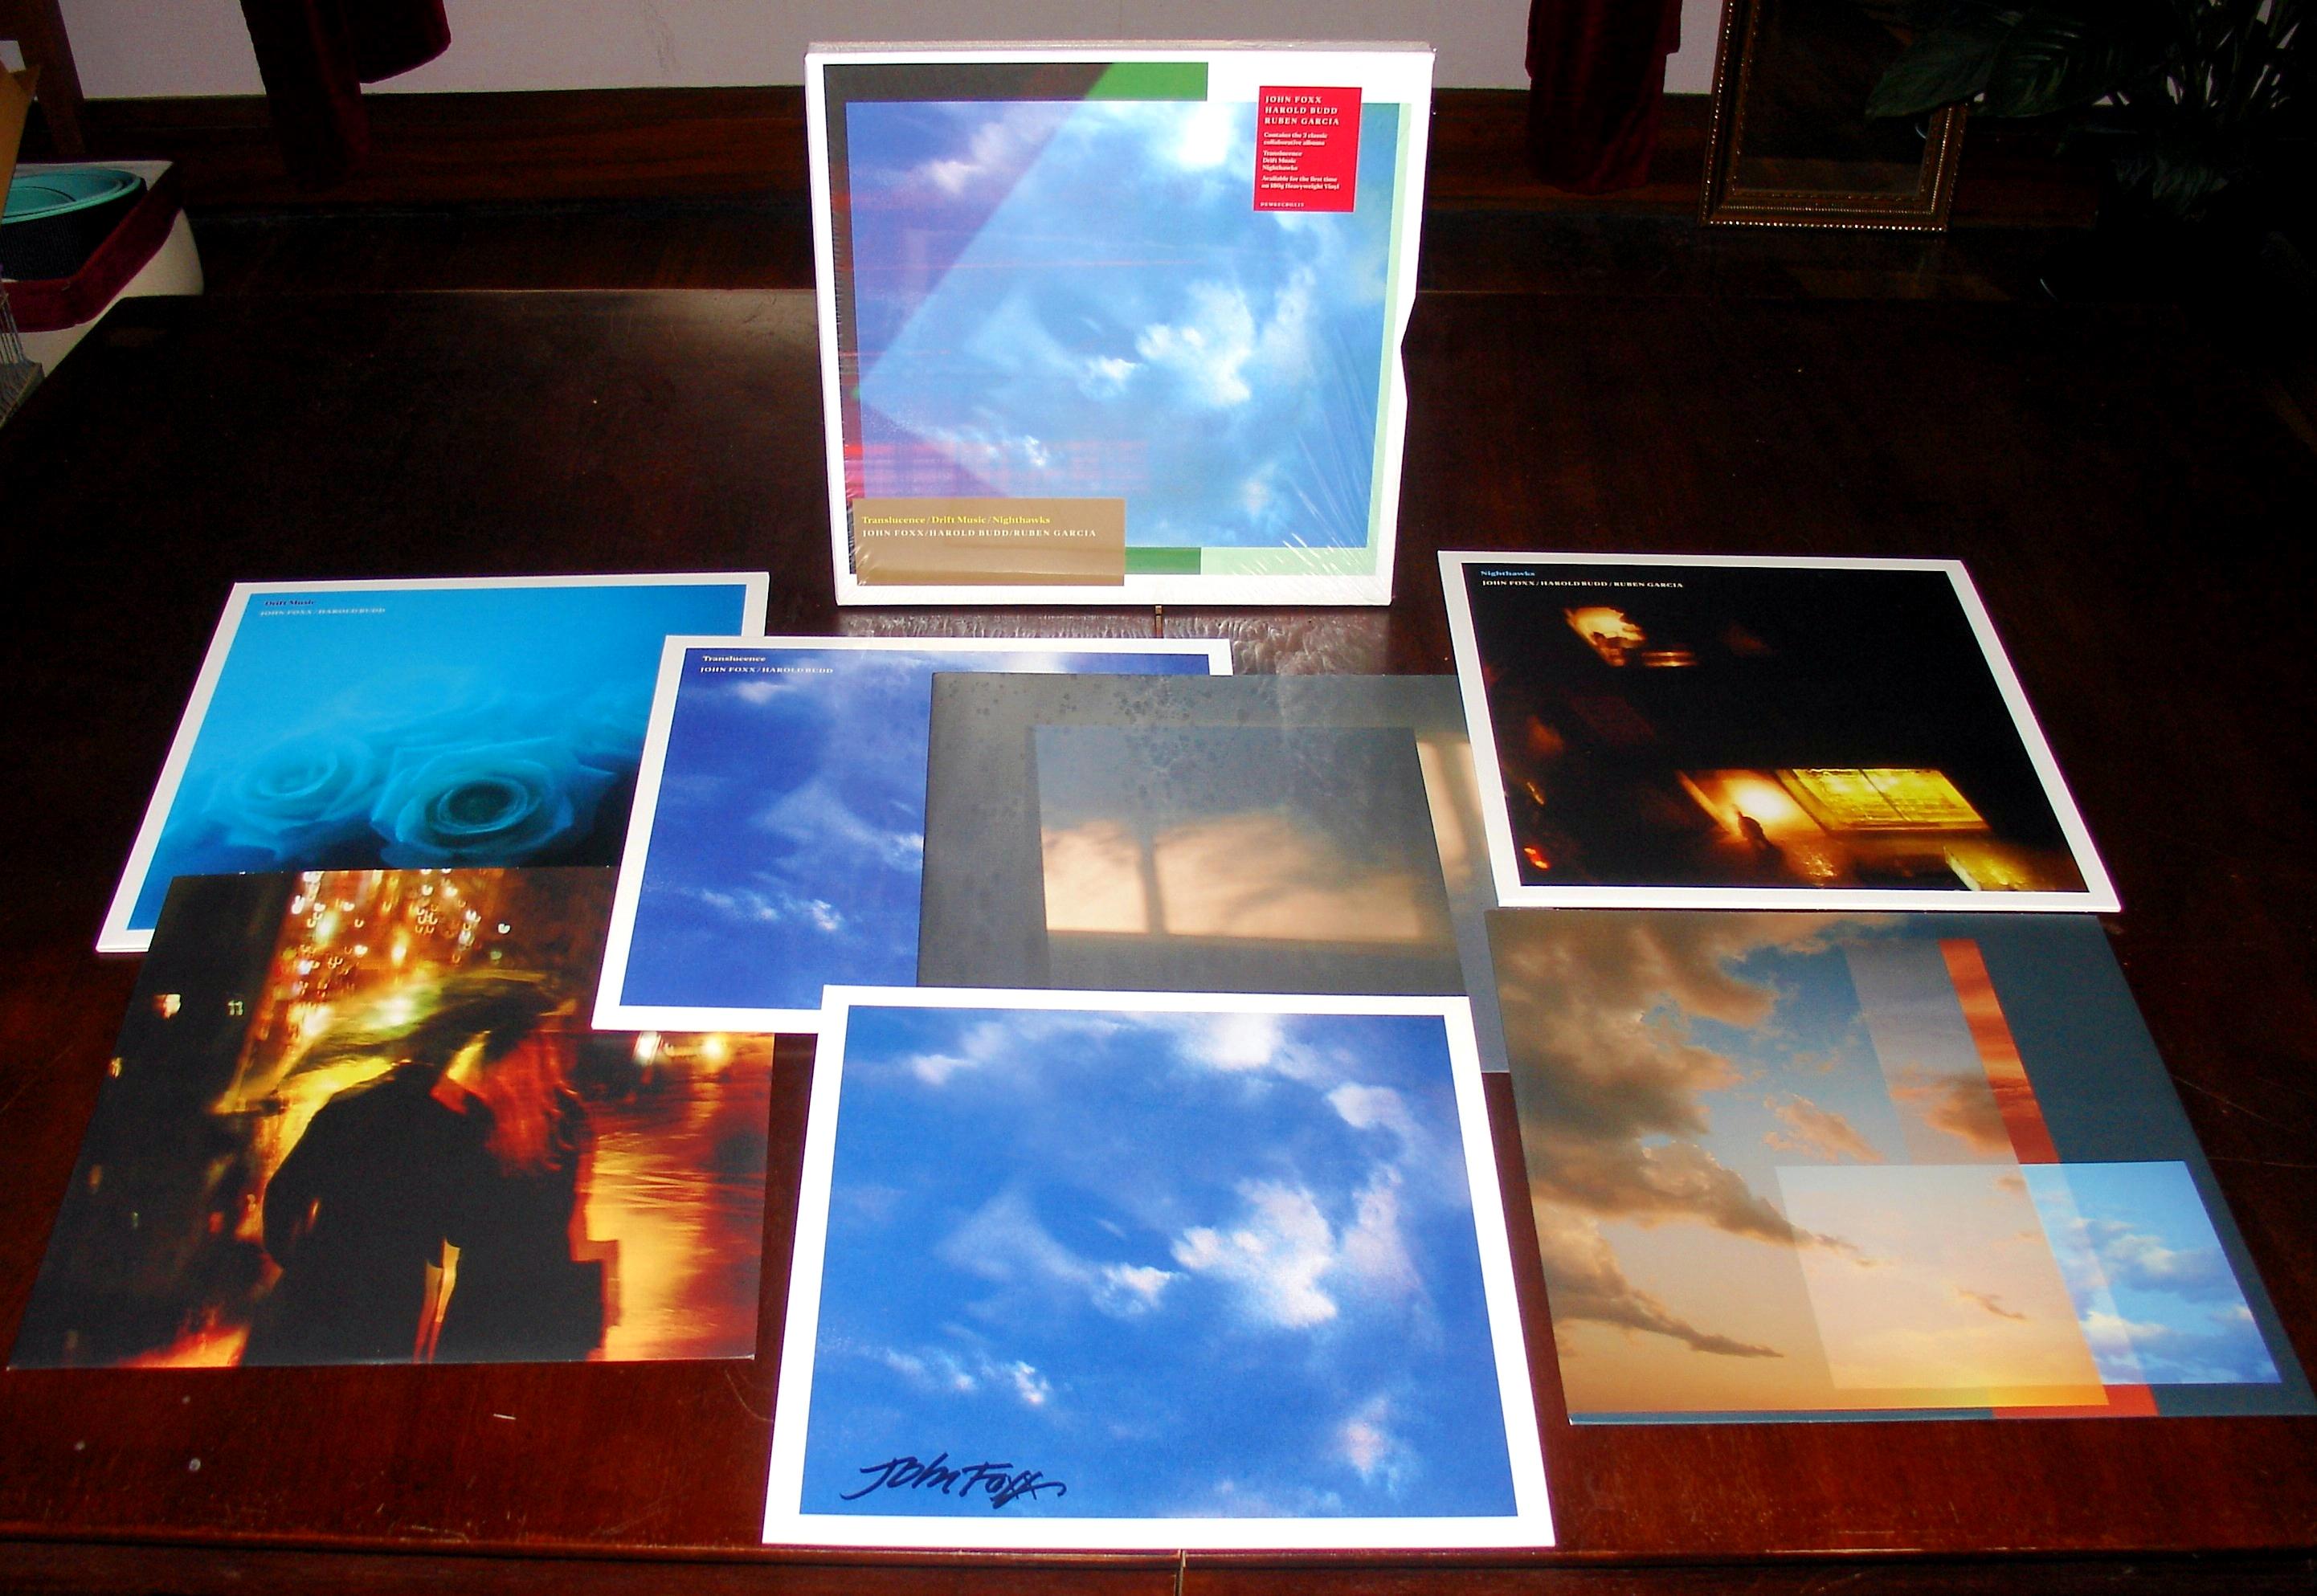 Harold Budd & John Foxx - Translucence Drift Music Nighthawks Box Set